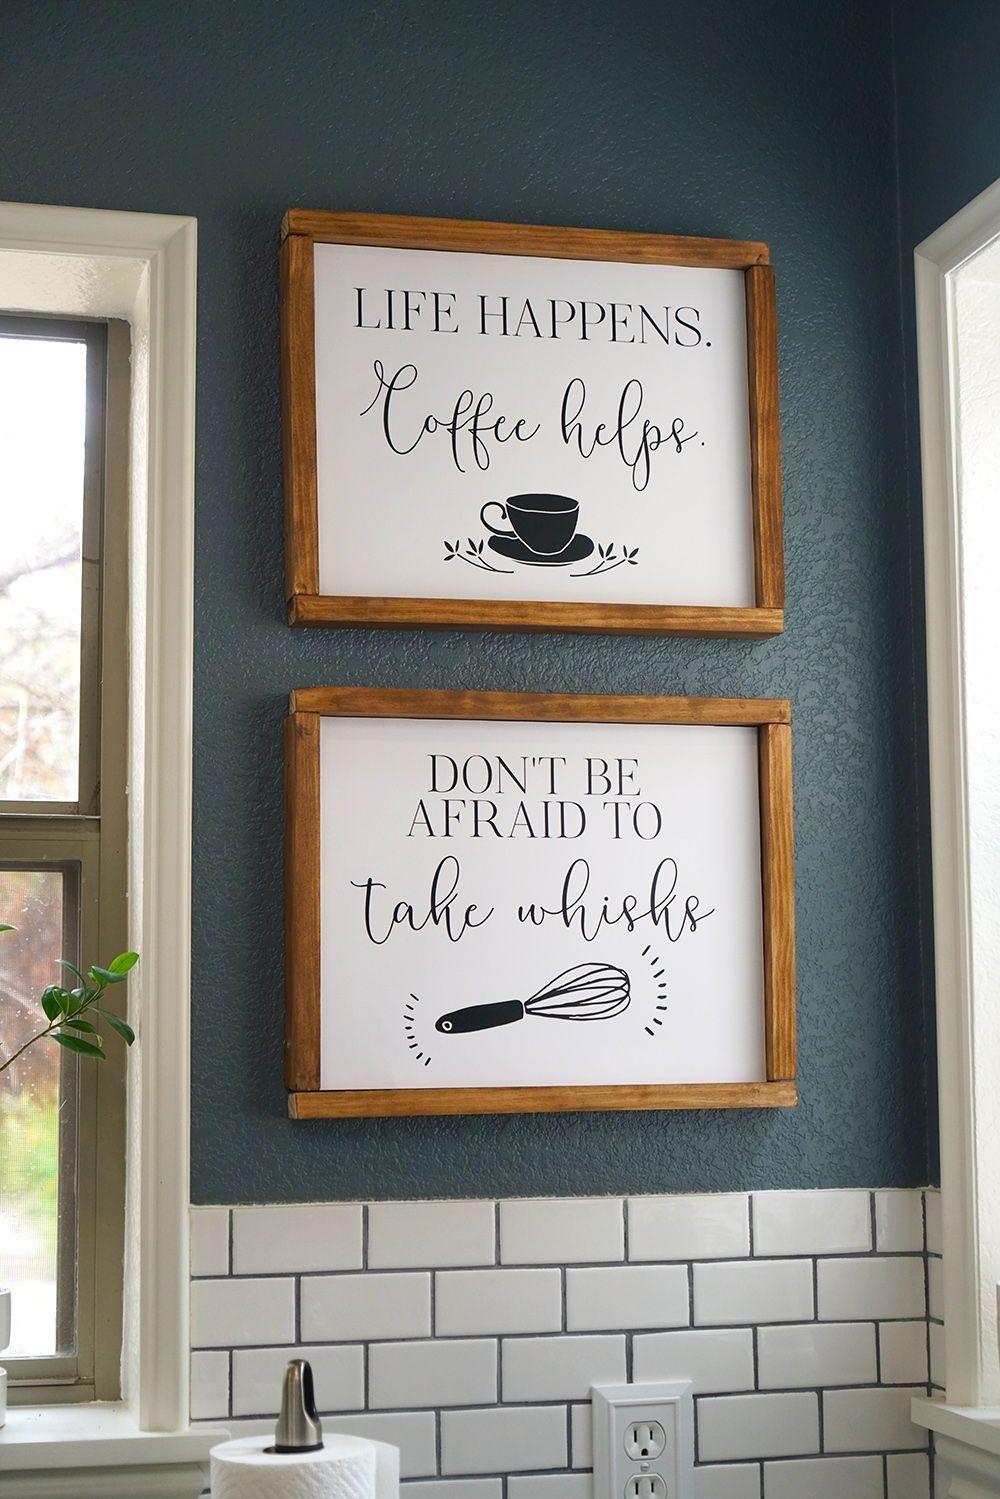 Funny Kitchen Wall Art Printable Life Happens Coffee Helps Etsy Kitchen Wall Art Printables Kitchen Wall Art Kitchen Decor Signs